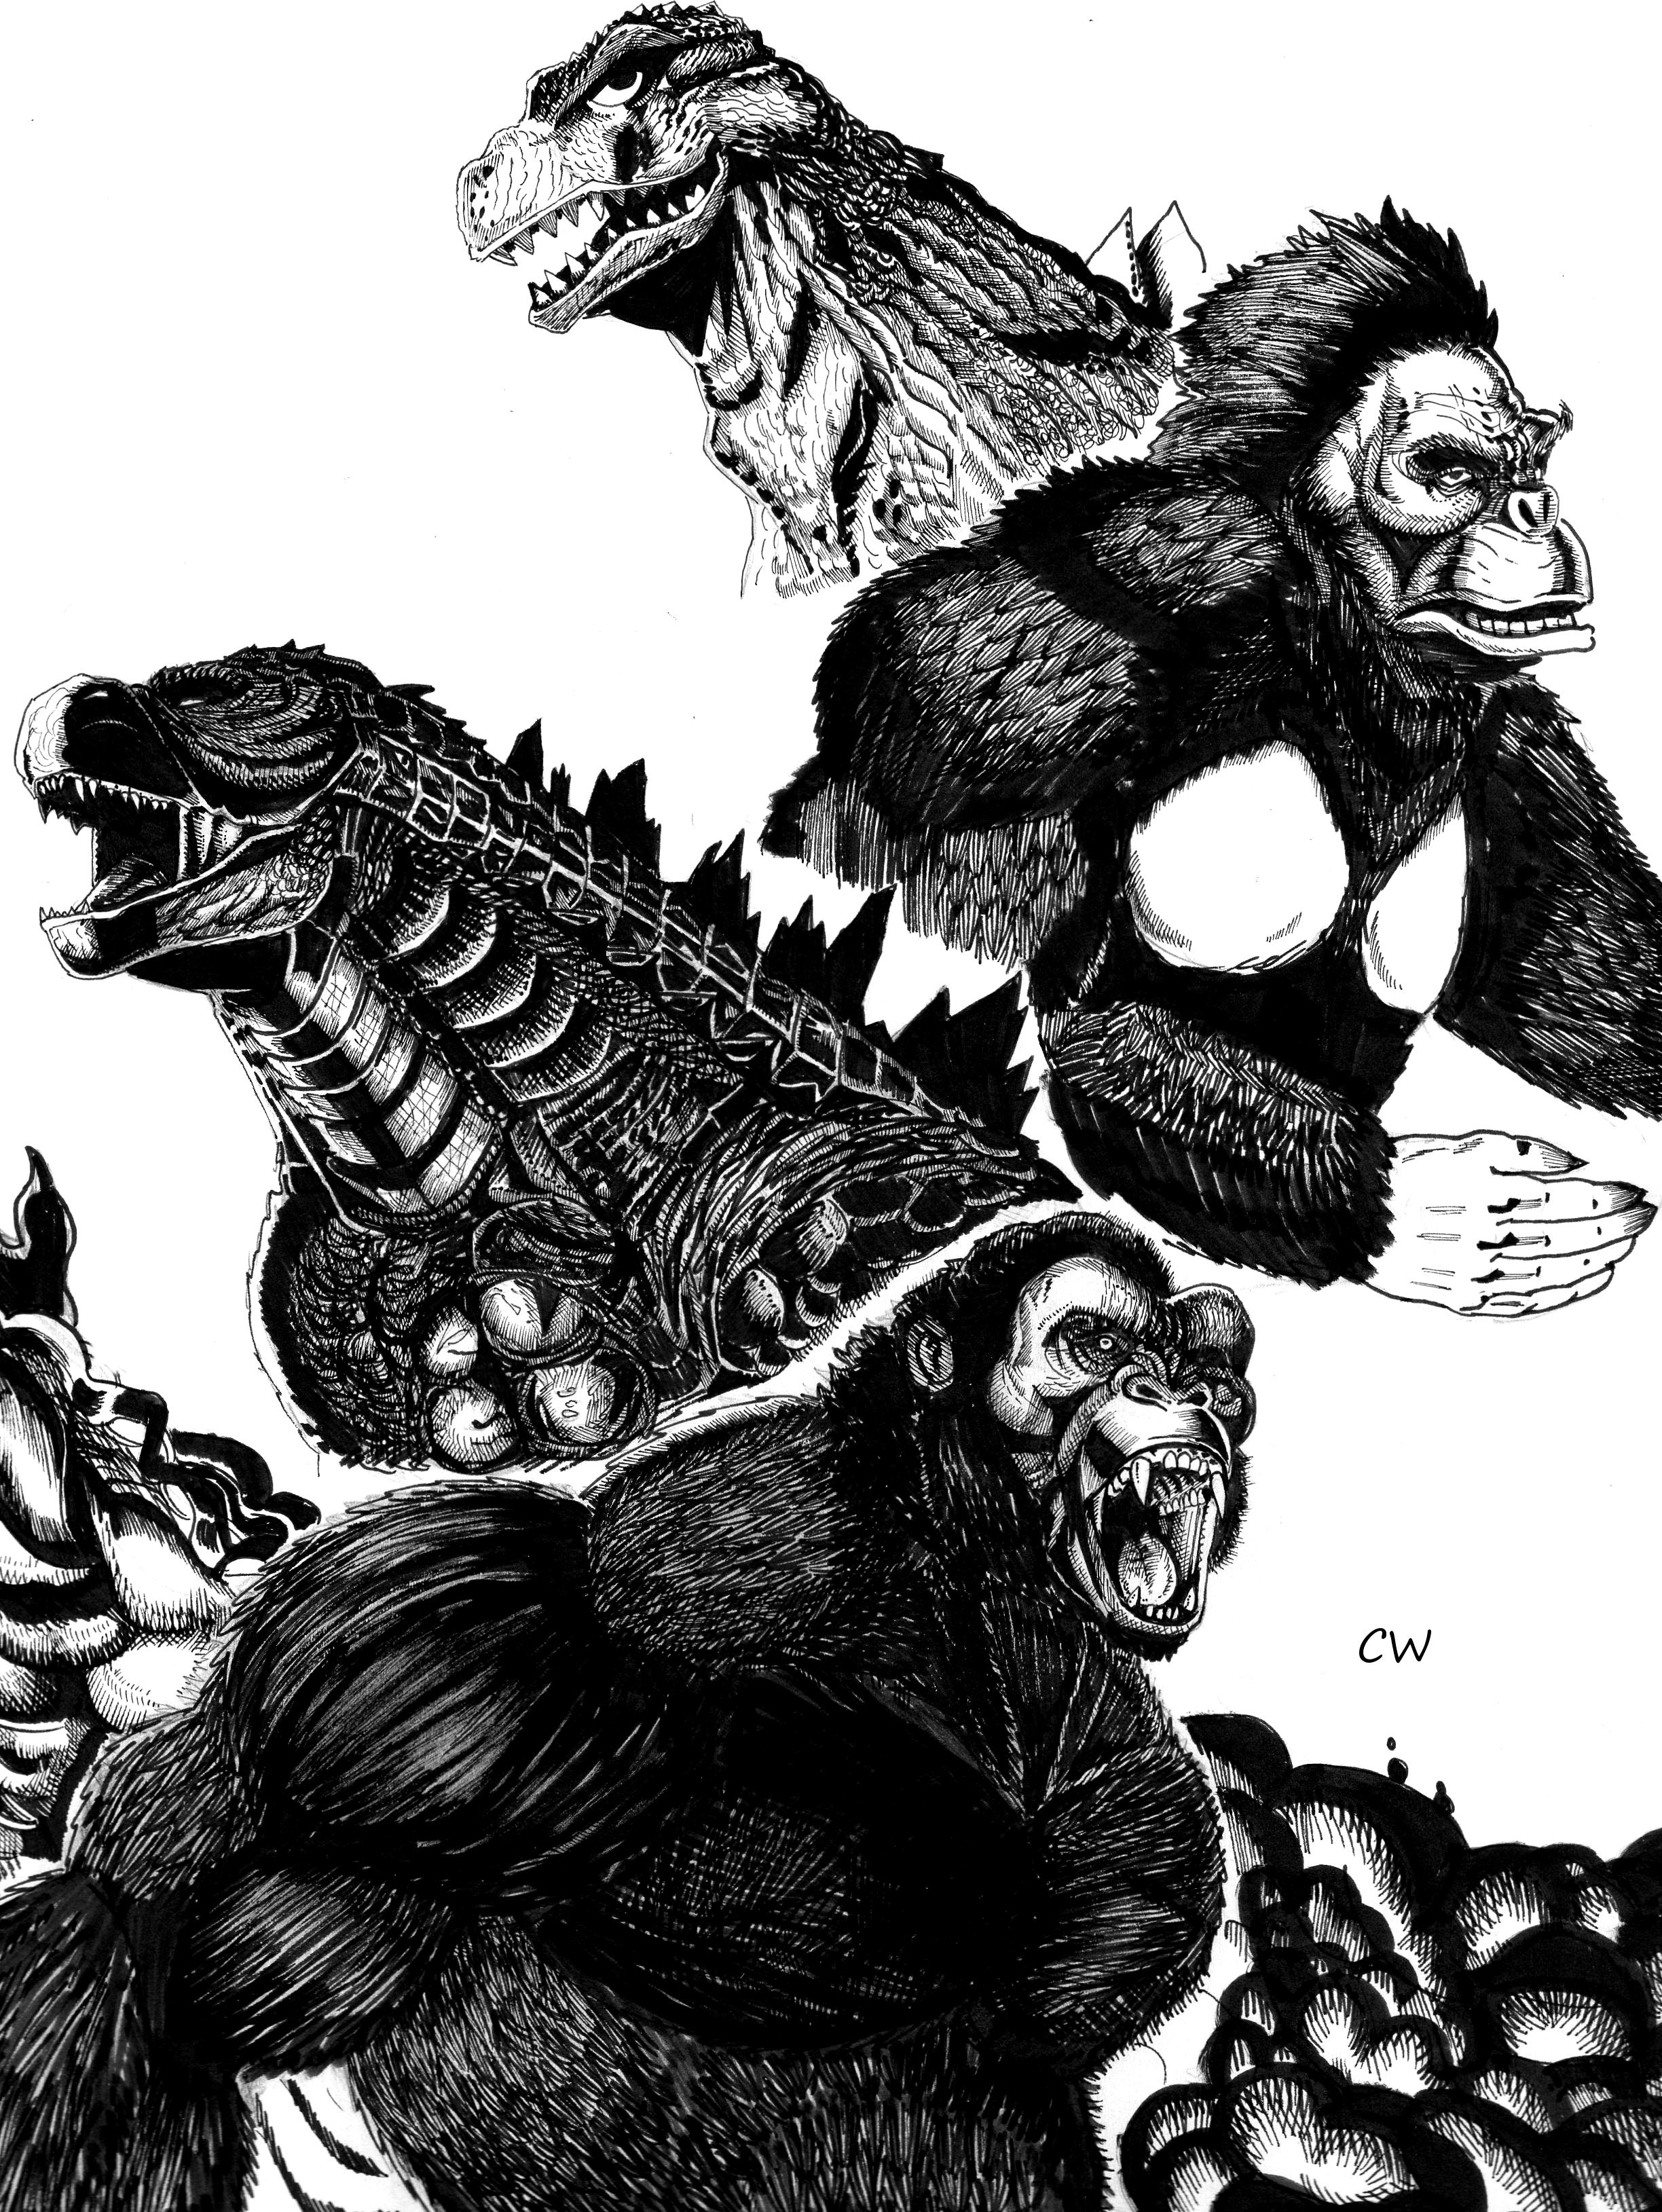 Godzilla VS King Kong by ChristianWillett on DeviantArt